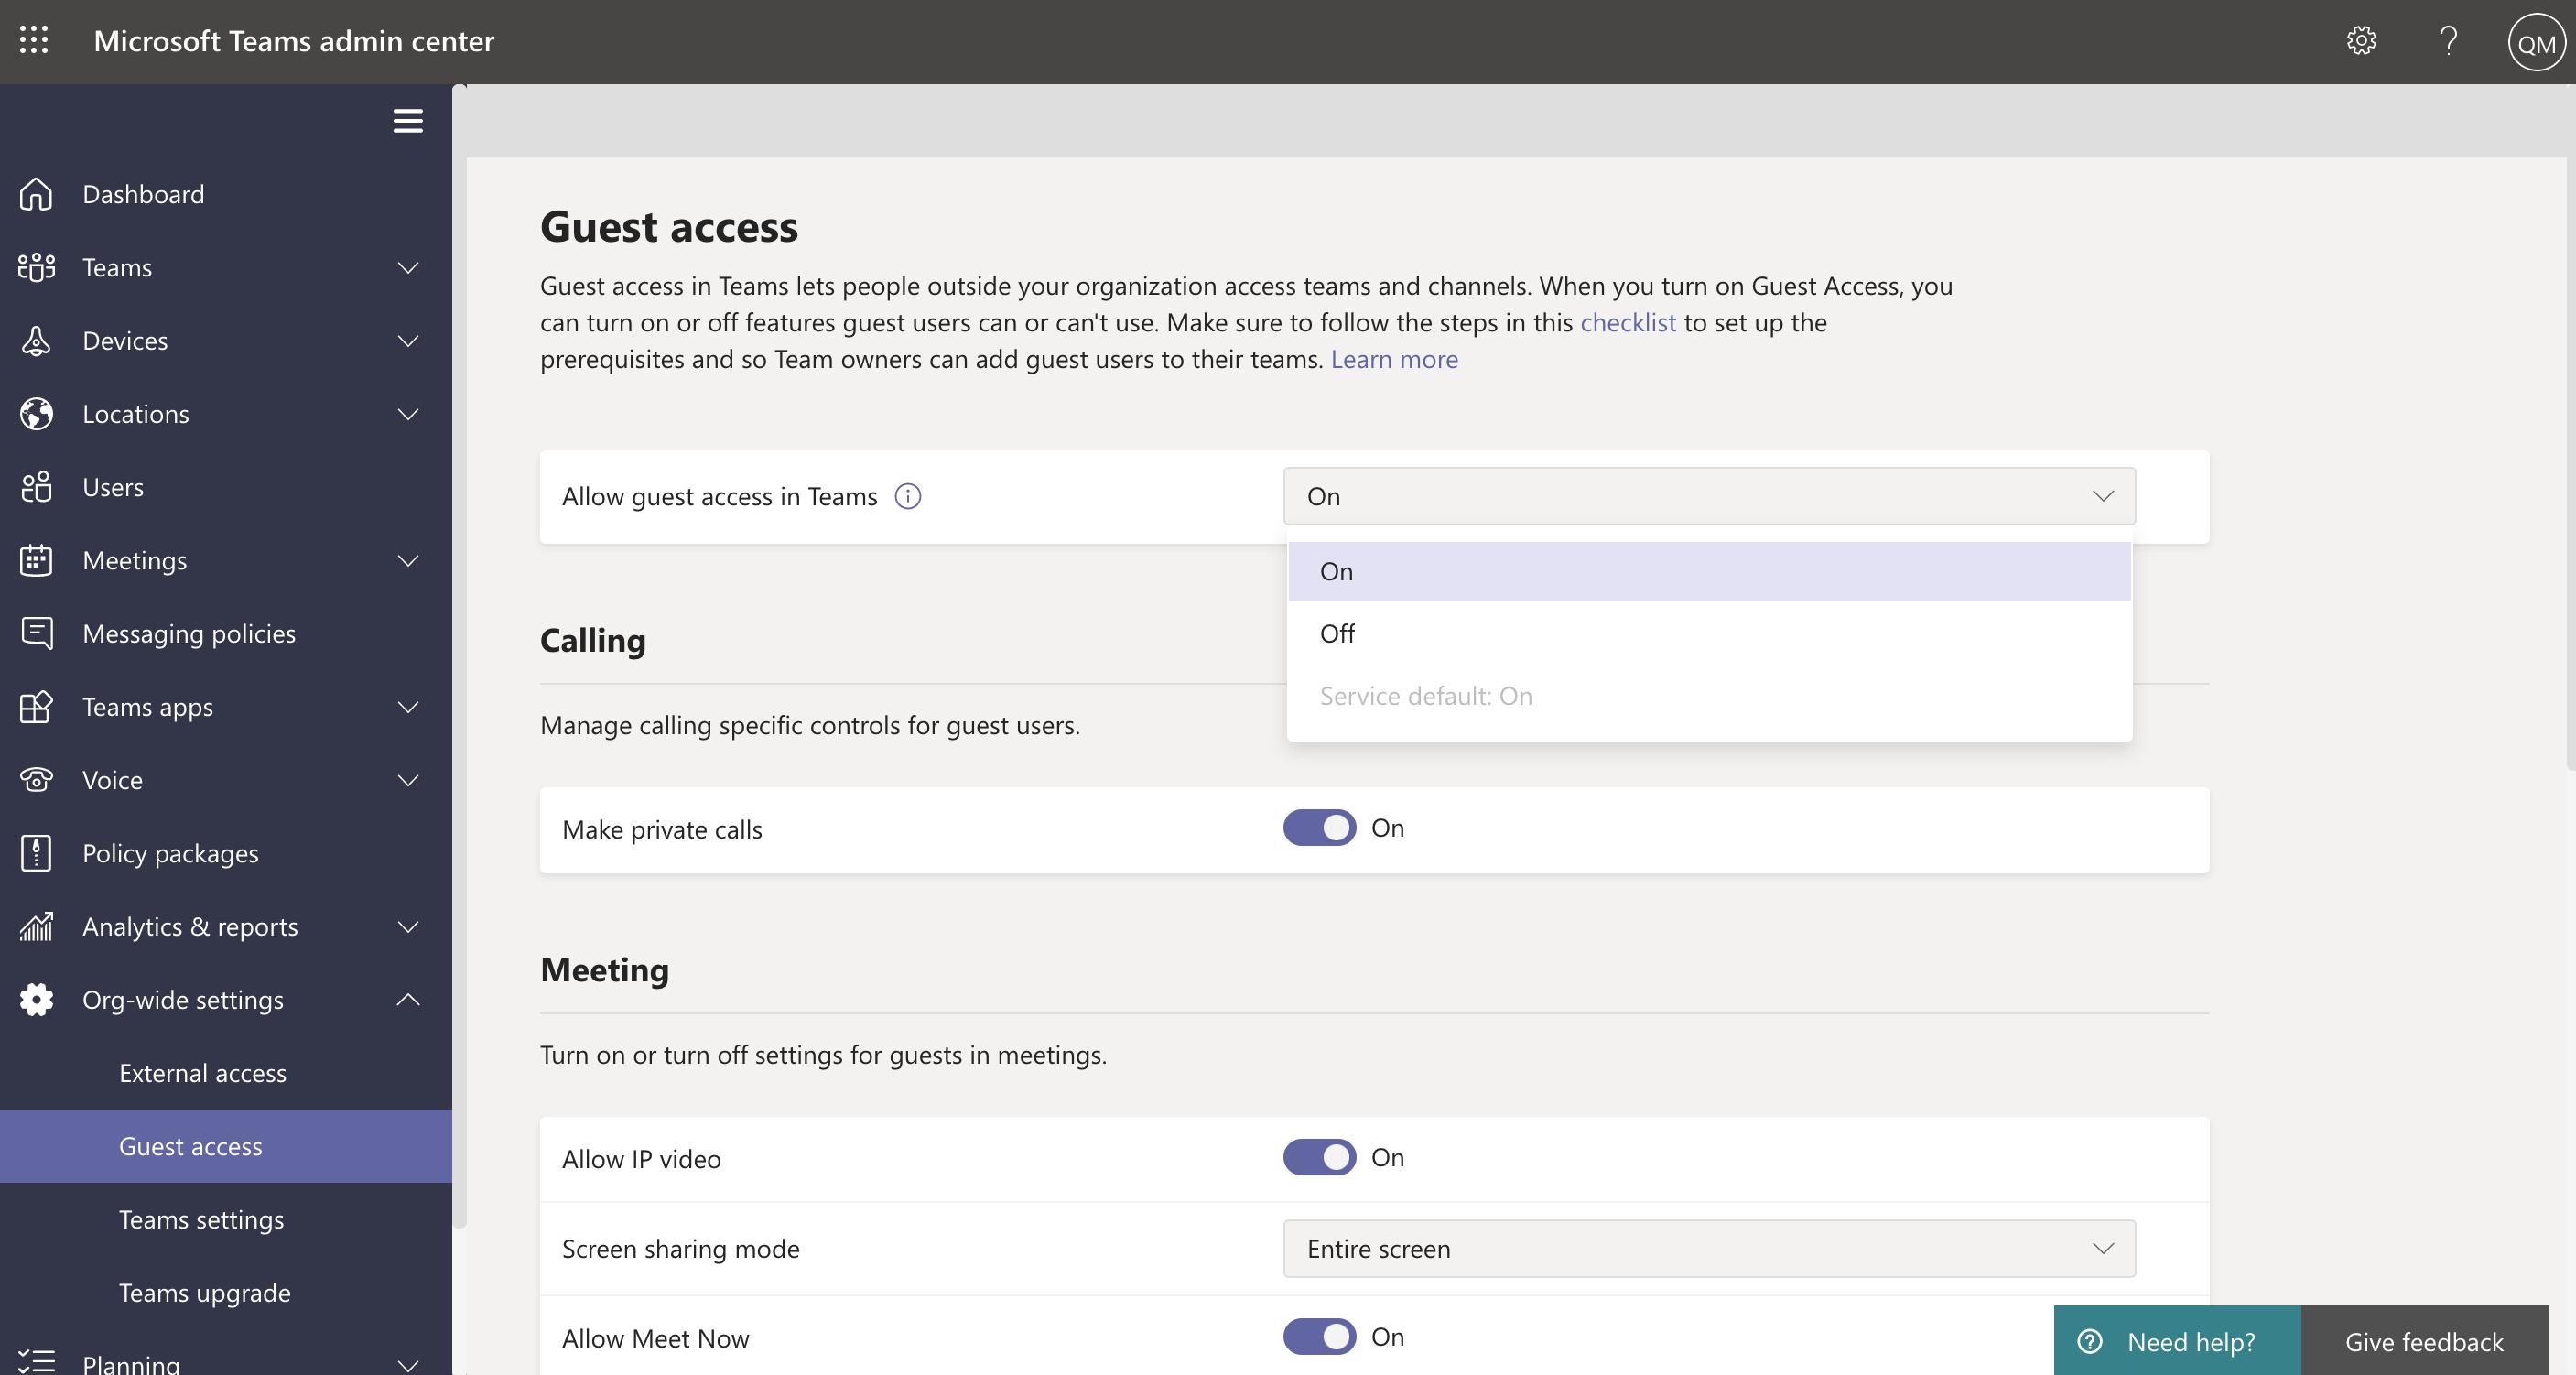 Screenshot of guest access settings in Teams admin center.